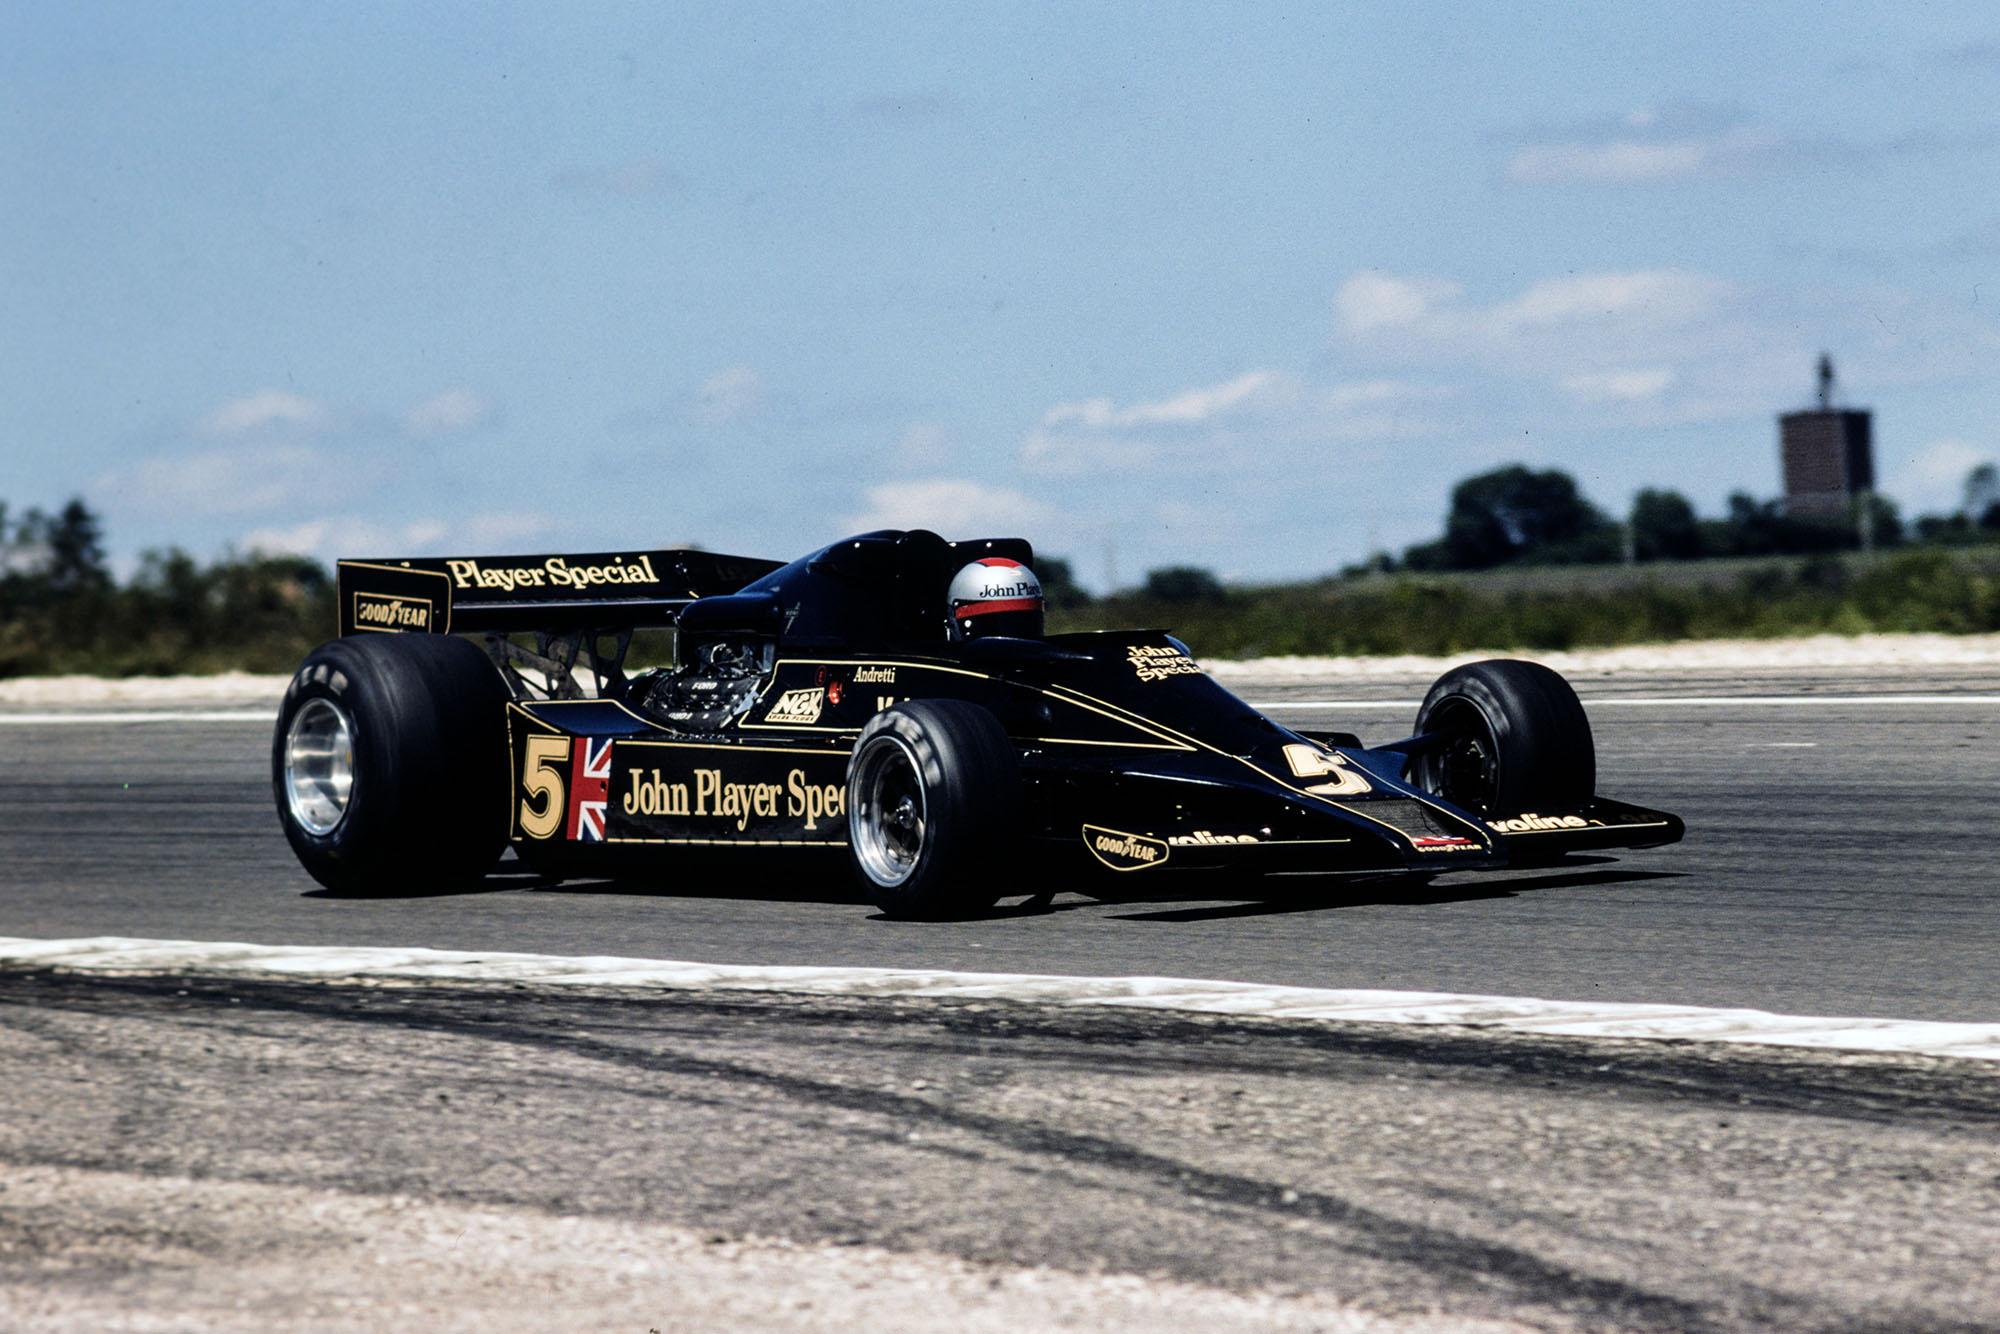 Mario Andretti (Lotus) at the 1977 french Grand Prix, Dijon.